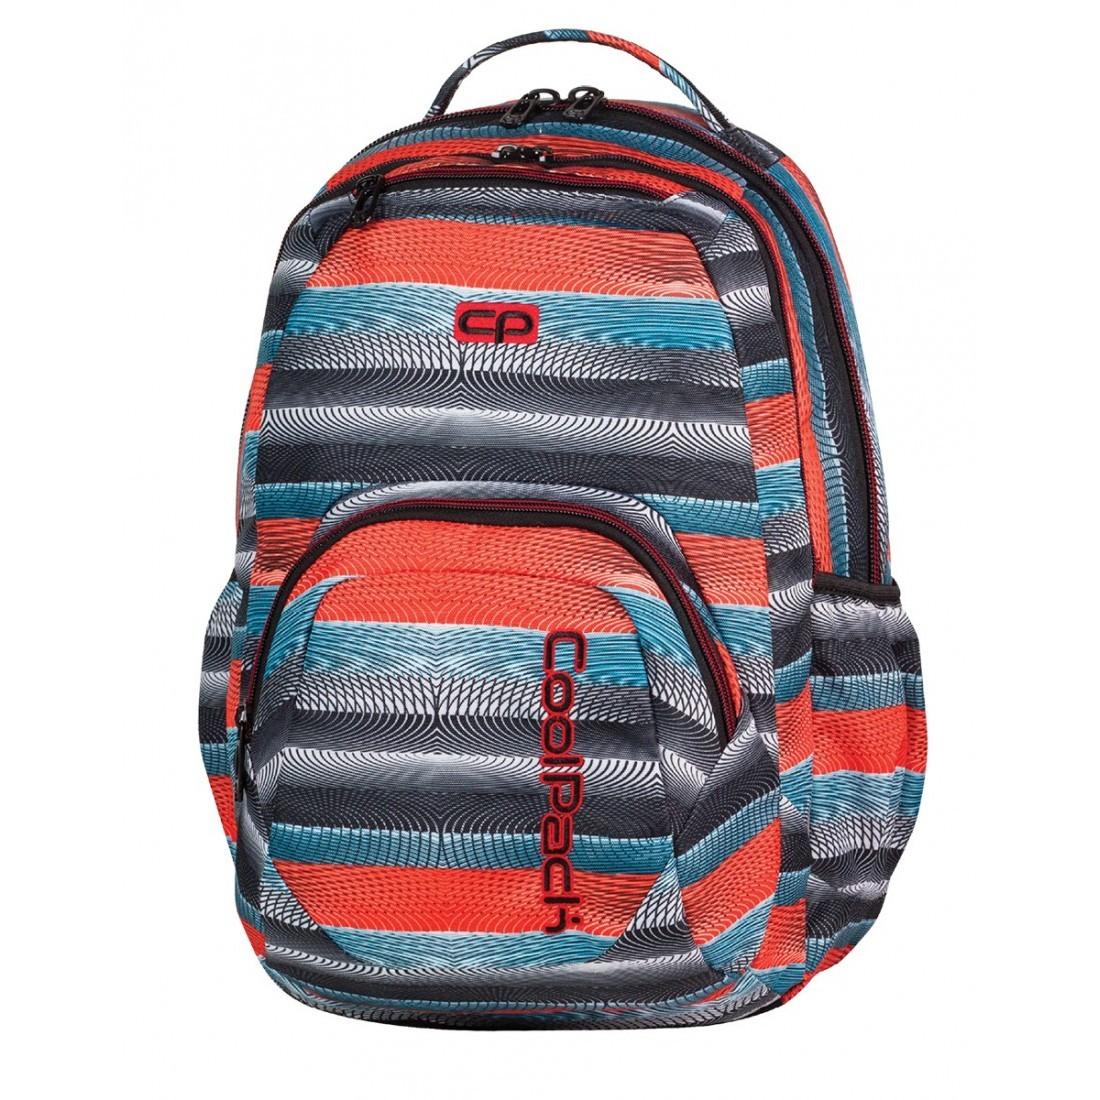 Plecak młodzieżowy CoolPack SMASH ORANGE TWIST CP 391 - plecak-tornister.pl